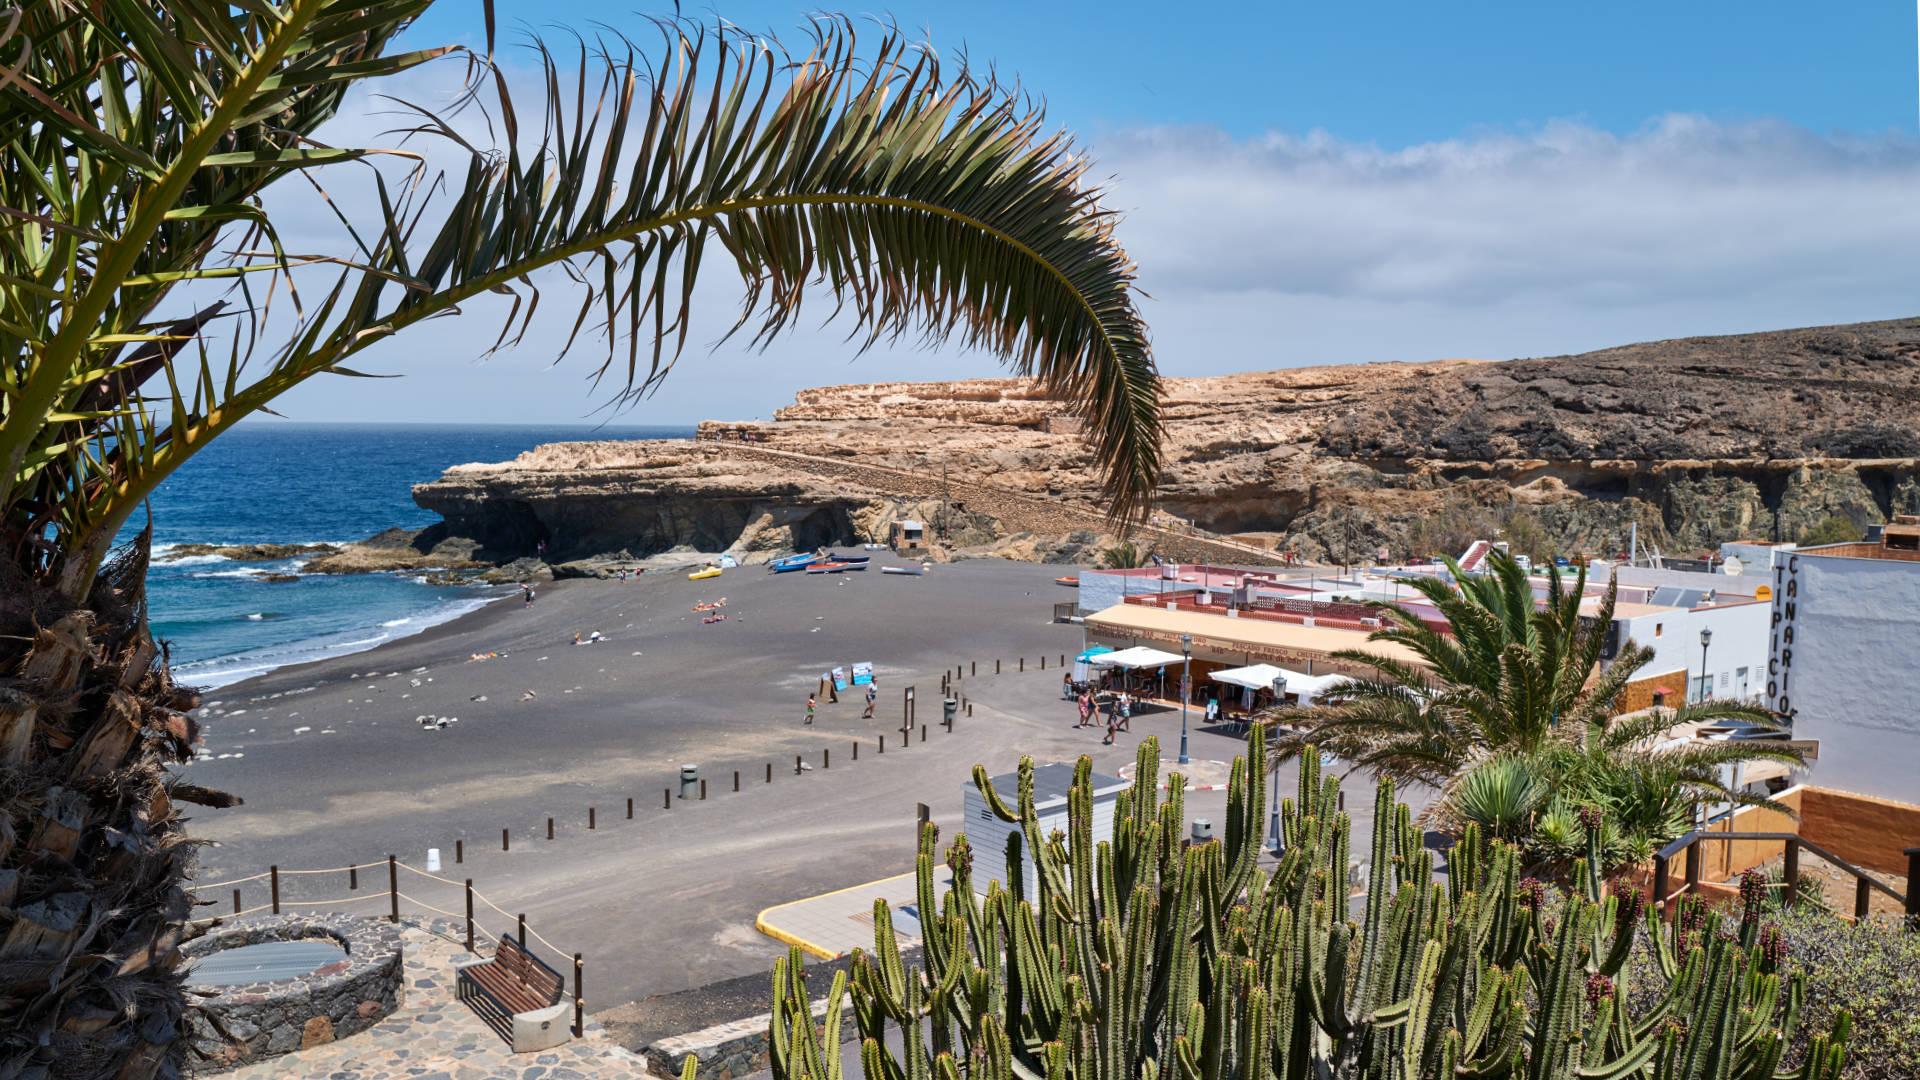 Der Ort Ajuy Fuerteventura.